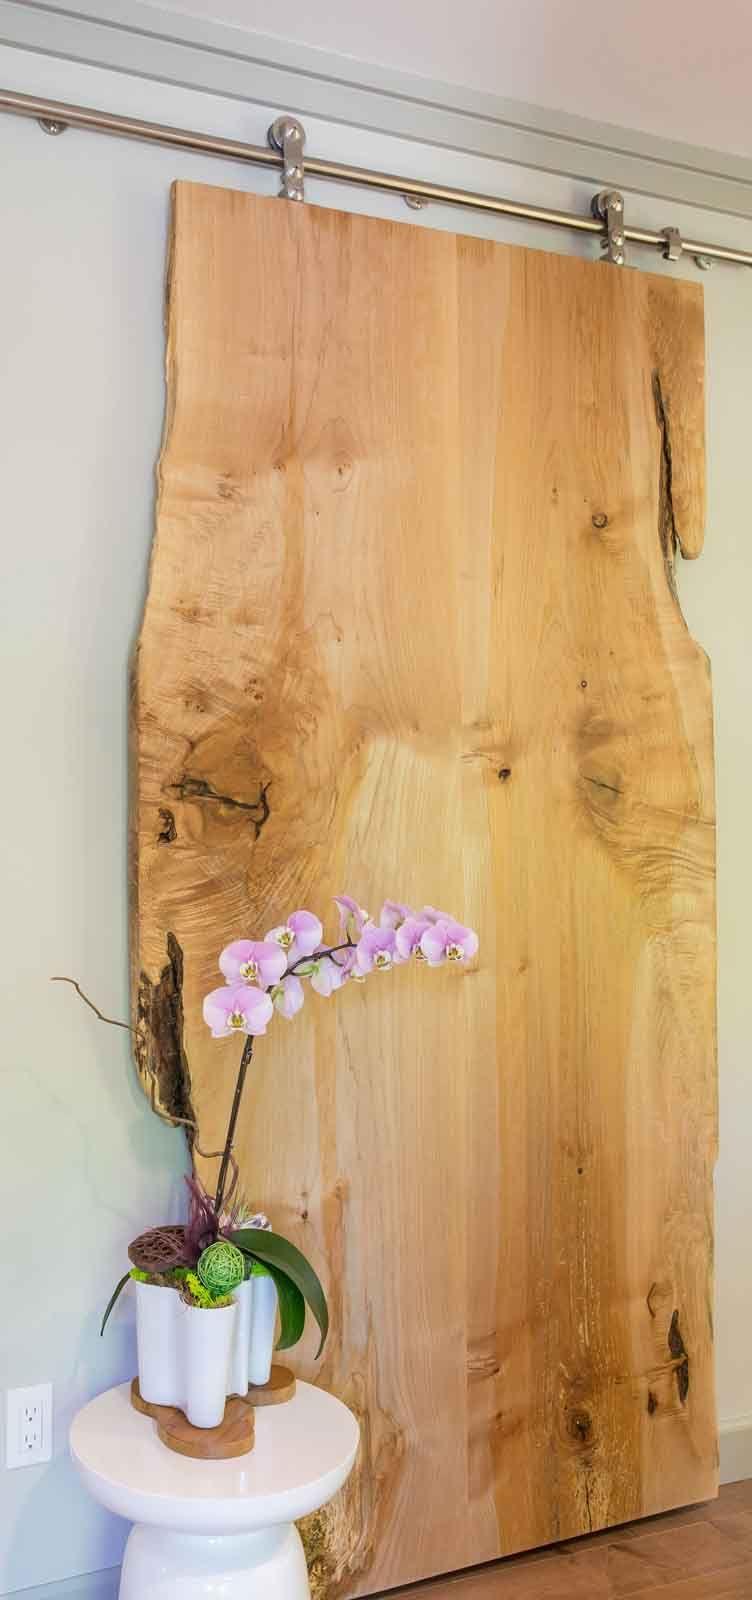 Sliding finished wood slab door in Kirkland, Washington condo retreat - by Amy May, May Designs, Seattle, WA.